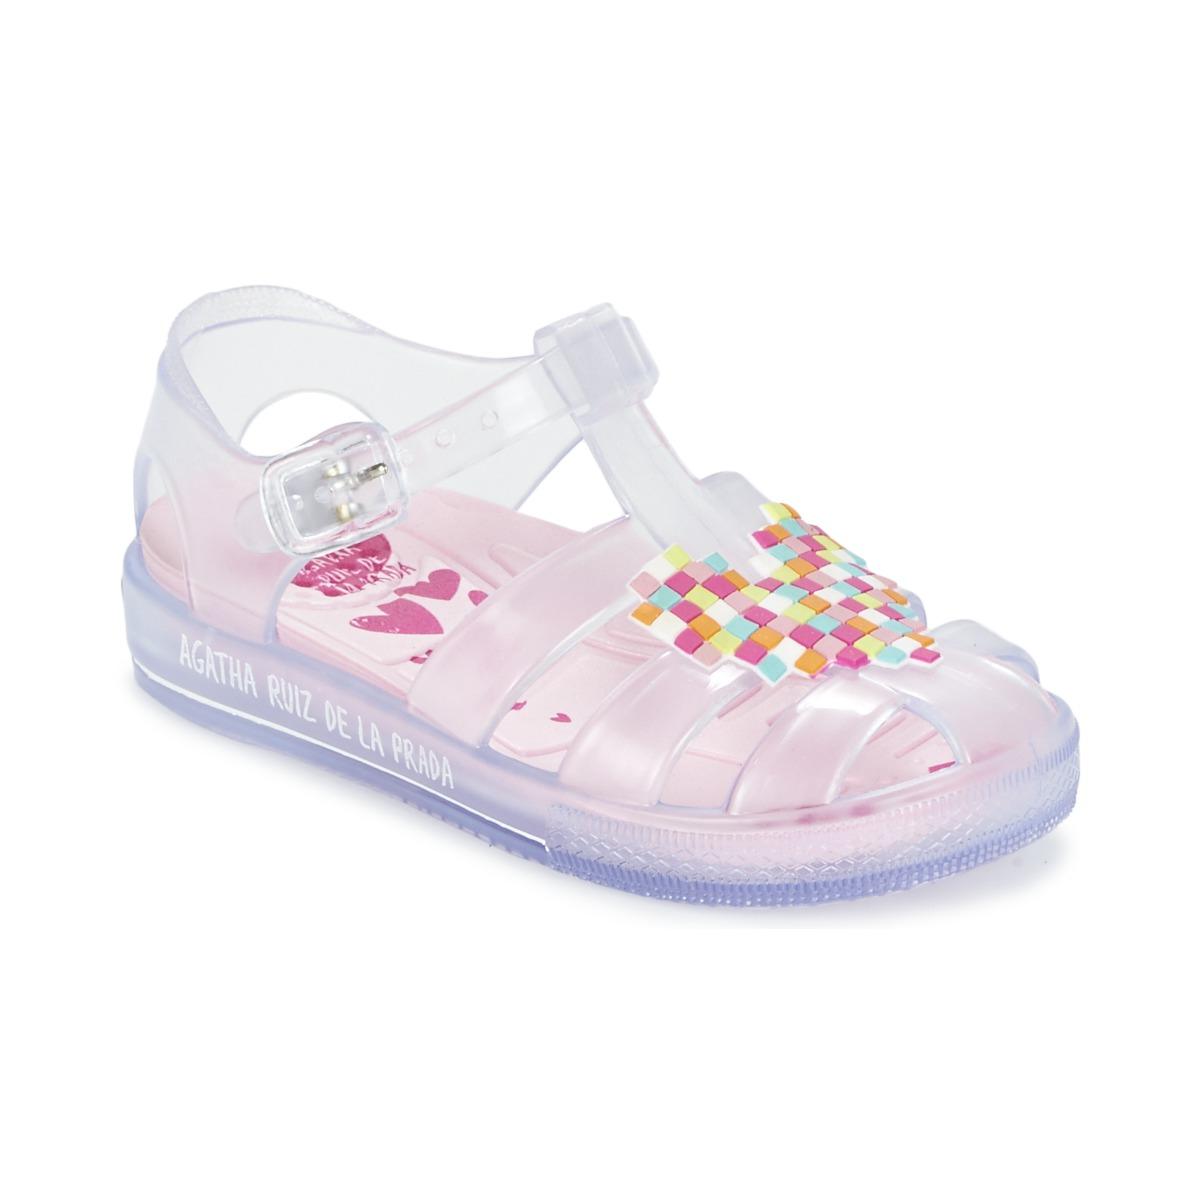 Sandals Agatha Ruiz de la Prada BASILA White